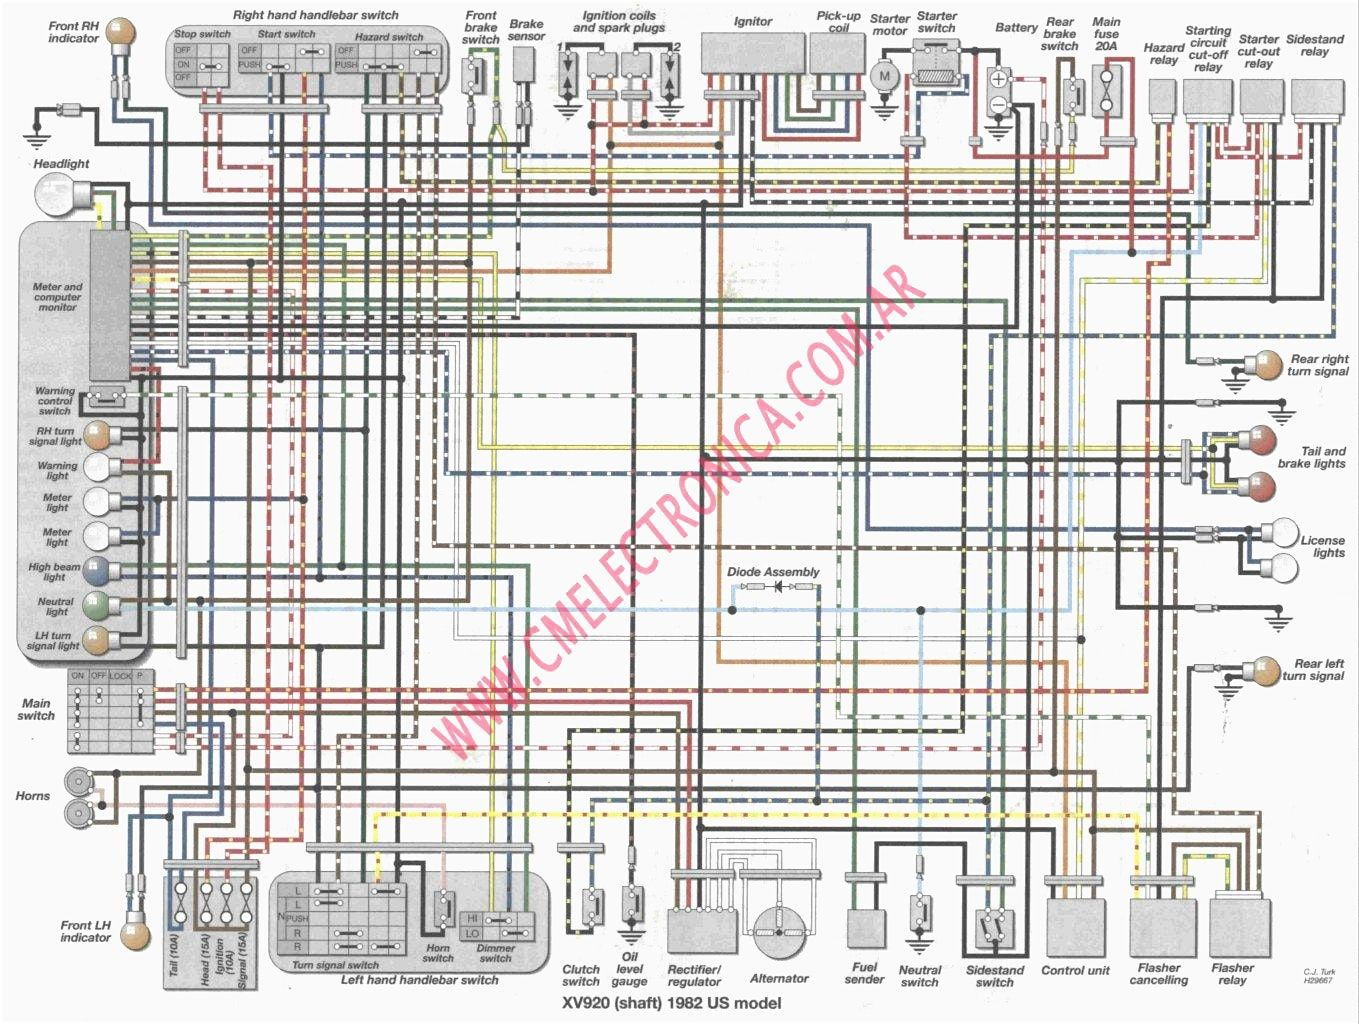 Virago 250 Wiring Diagram Mercury Alpha One Outdrive Diagrams 15341278 Xv250 Yamaha Inside New